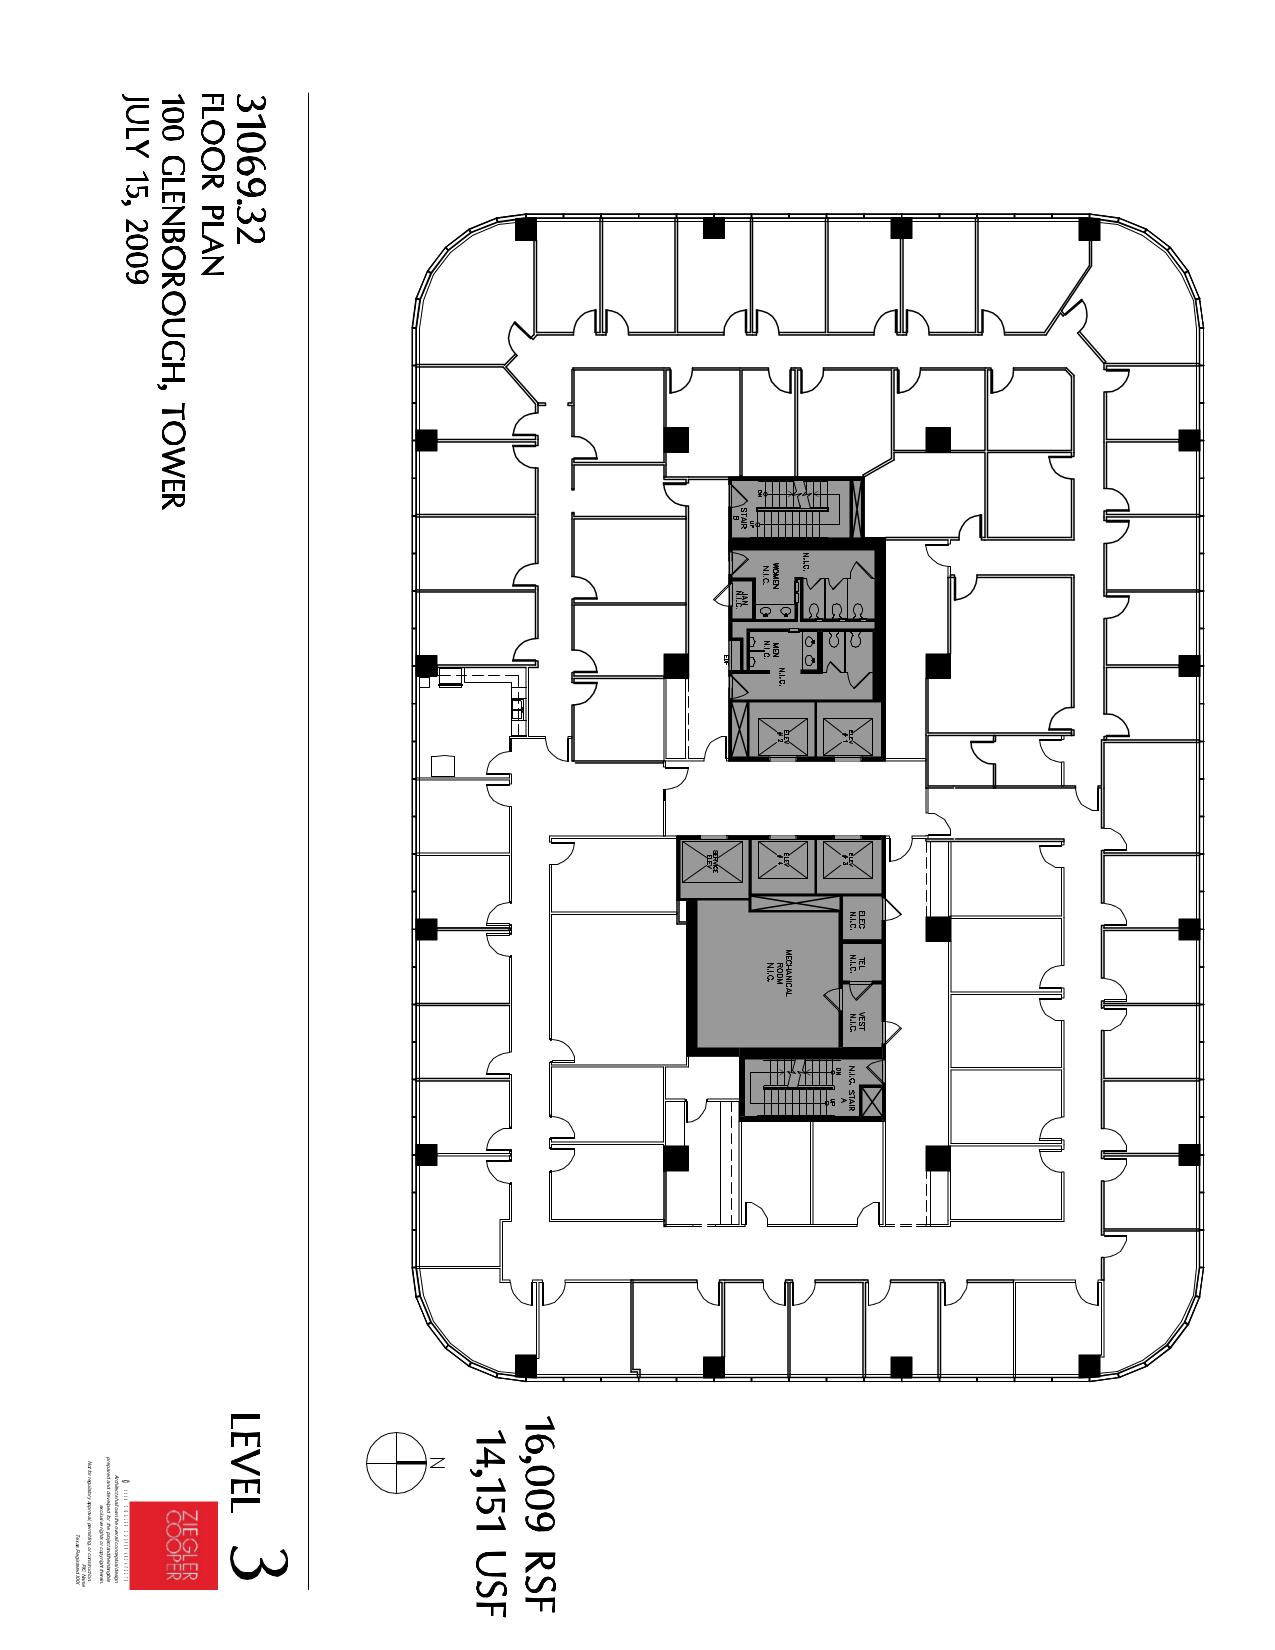 Northborough tower 100 glenborough dr 3rd floor unit 3rd for 100 floors 3rd floor